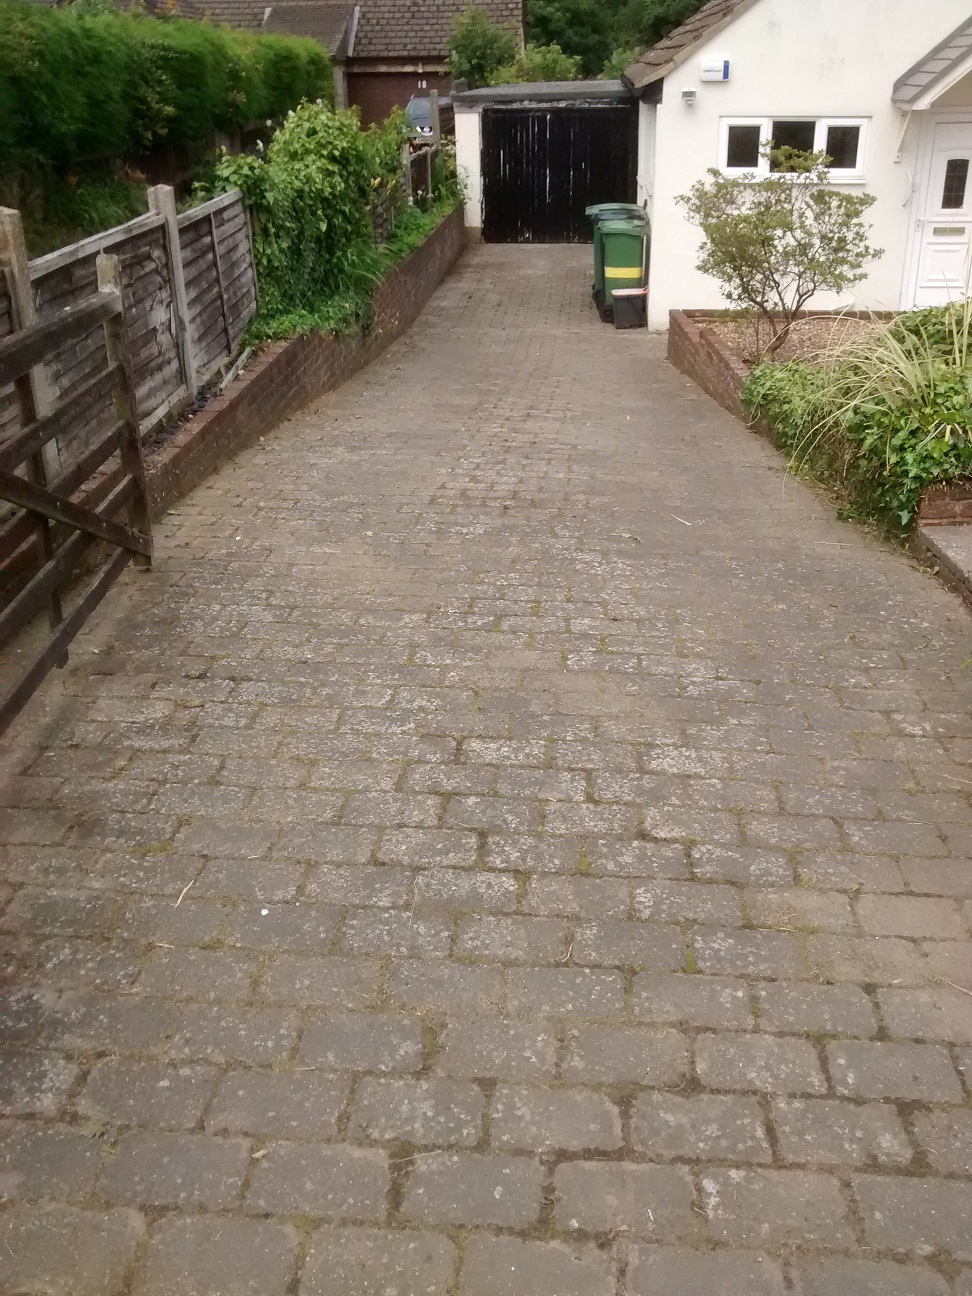 Weed-free driveway